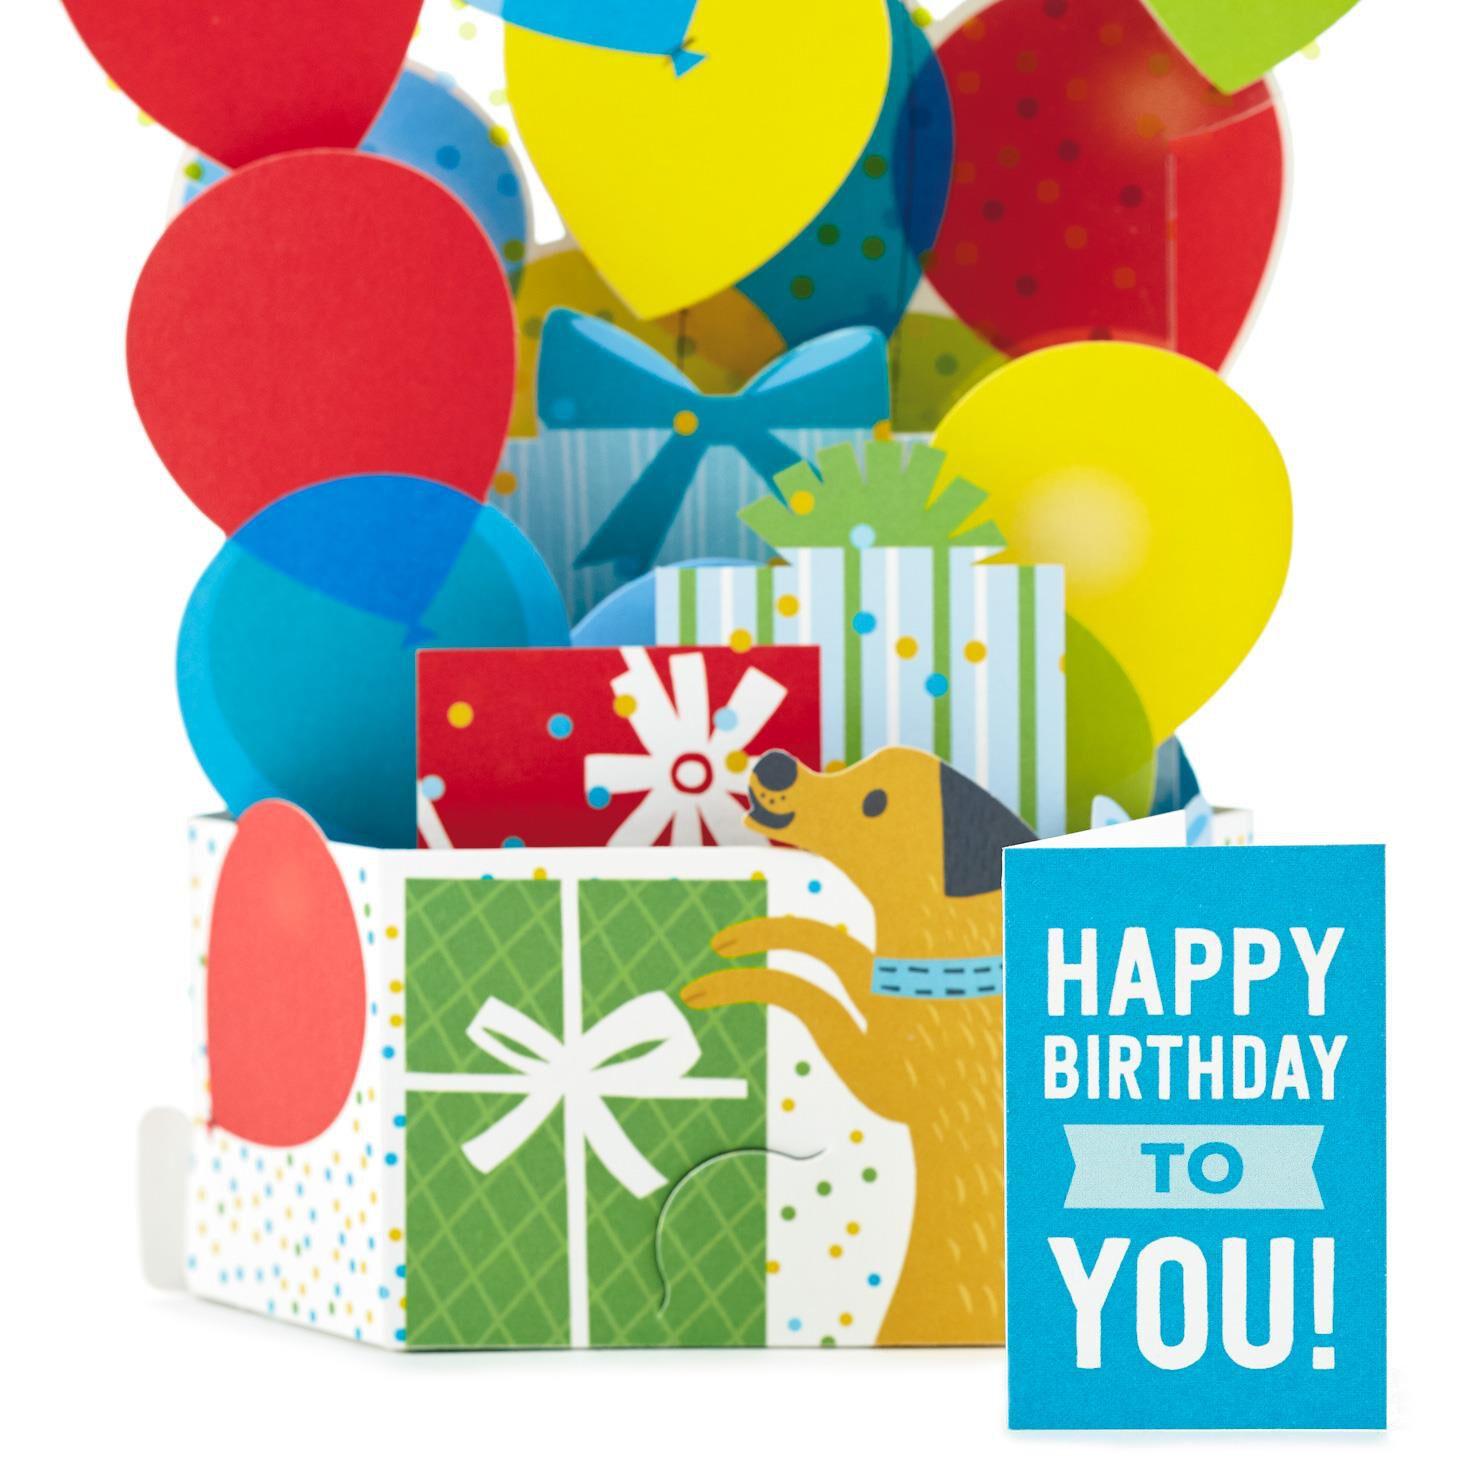 Burst of Balloons Pop Up Birthday Card - Greeting Cards - Hallmark